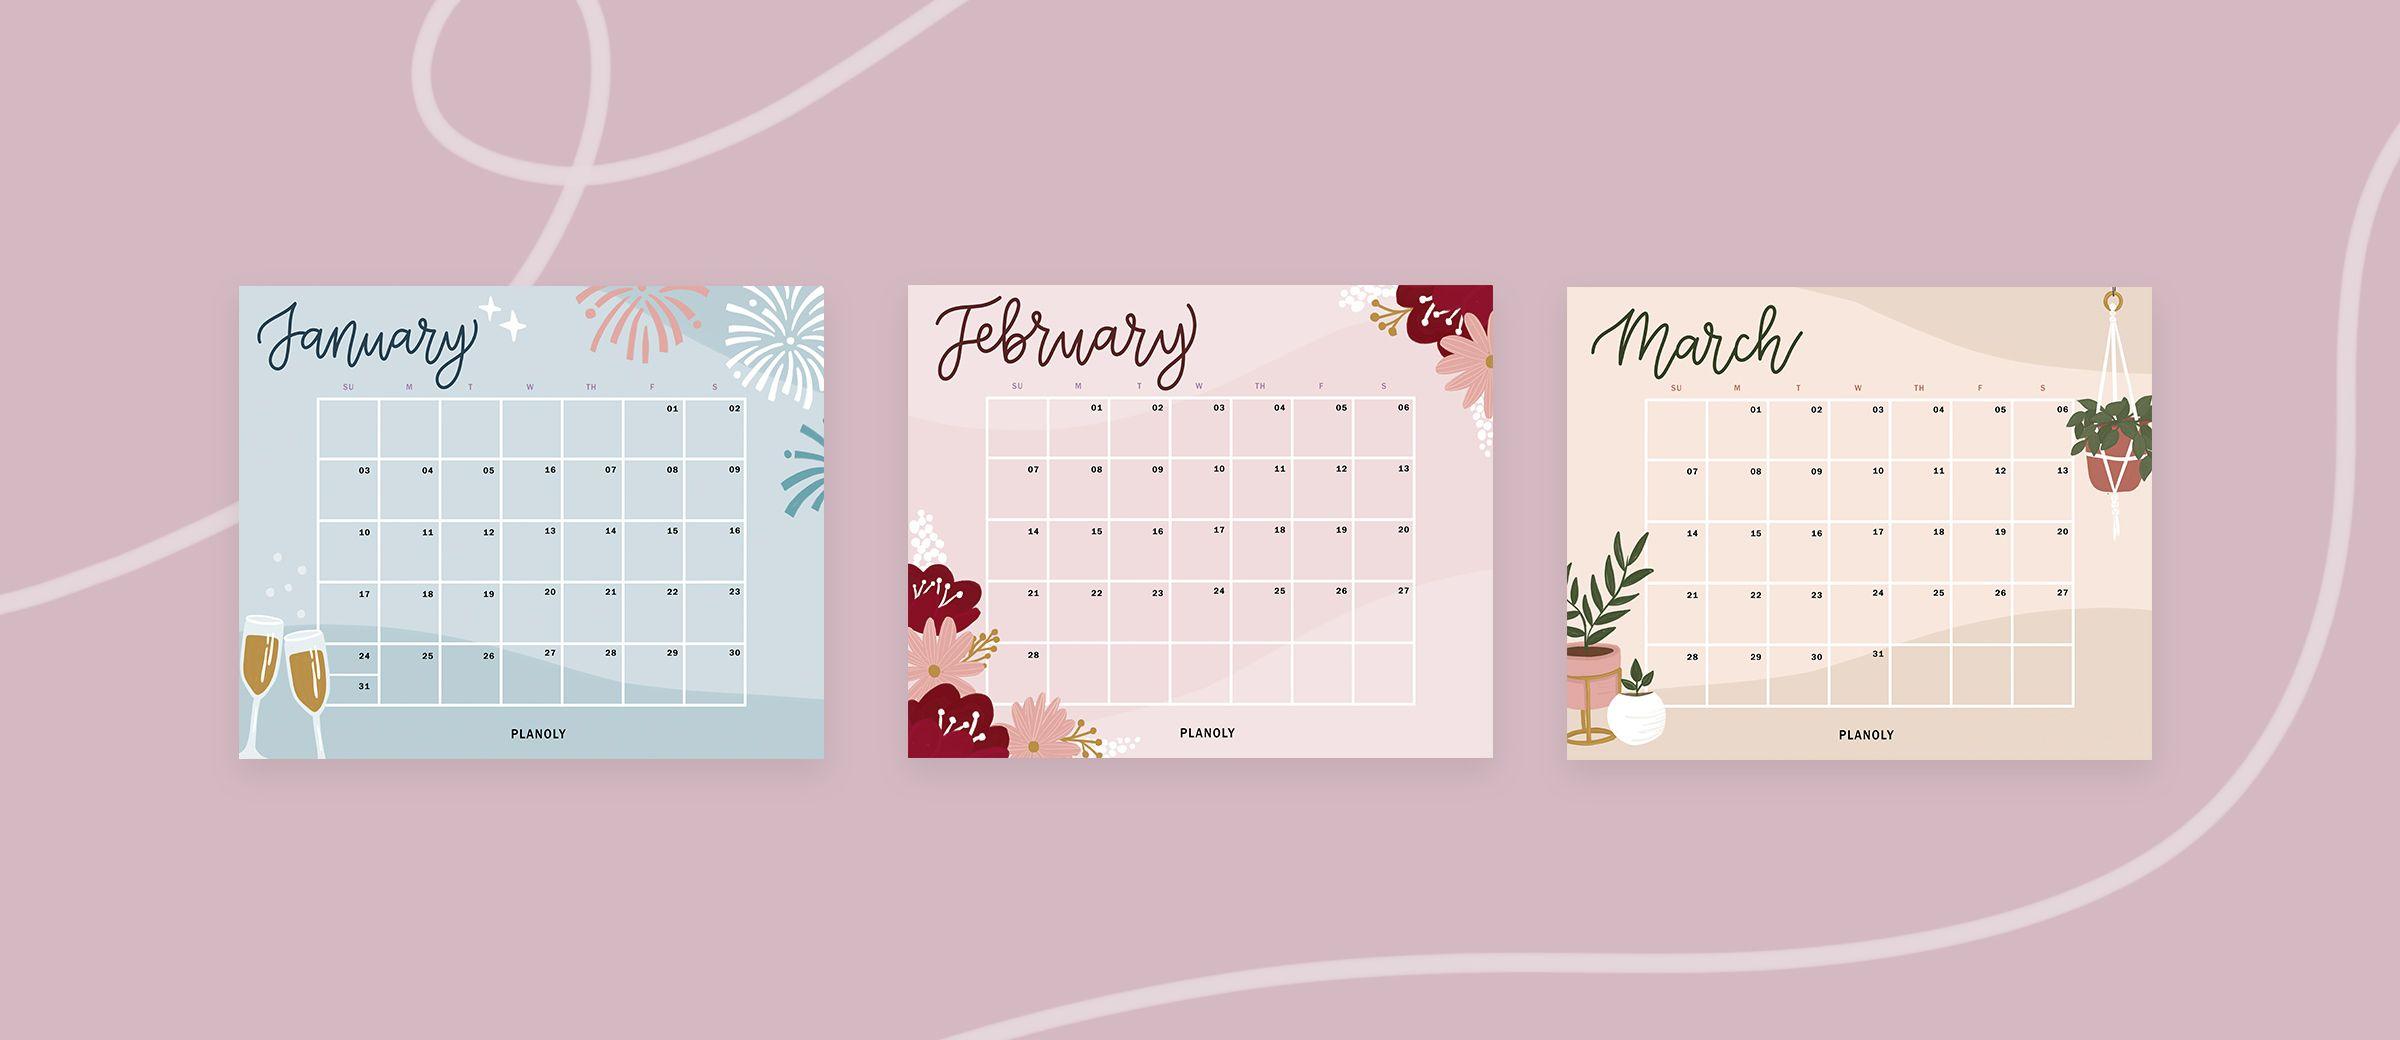 PLANOLY-Blog Post-Q1 Content Calendars-Banner